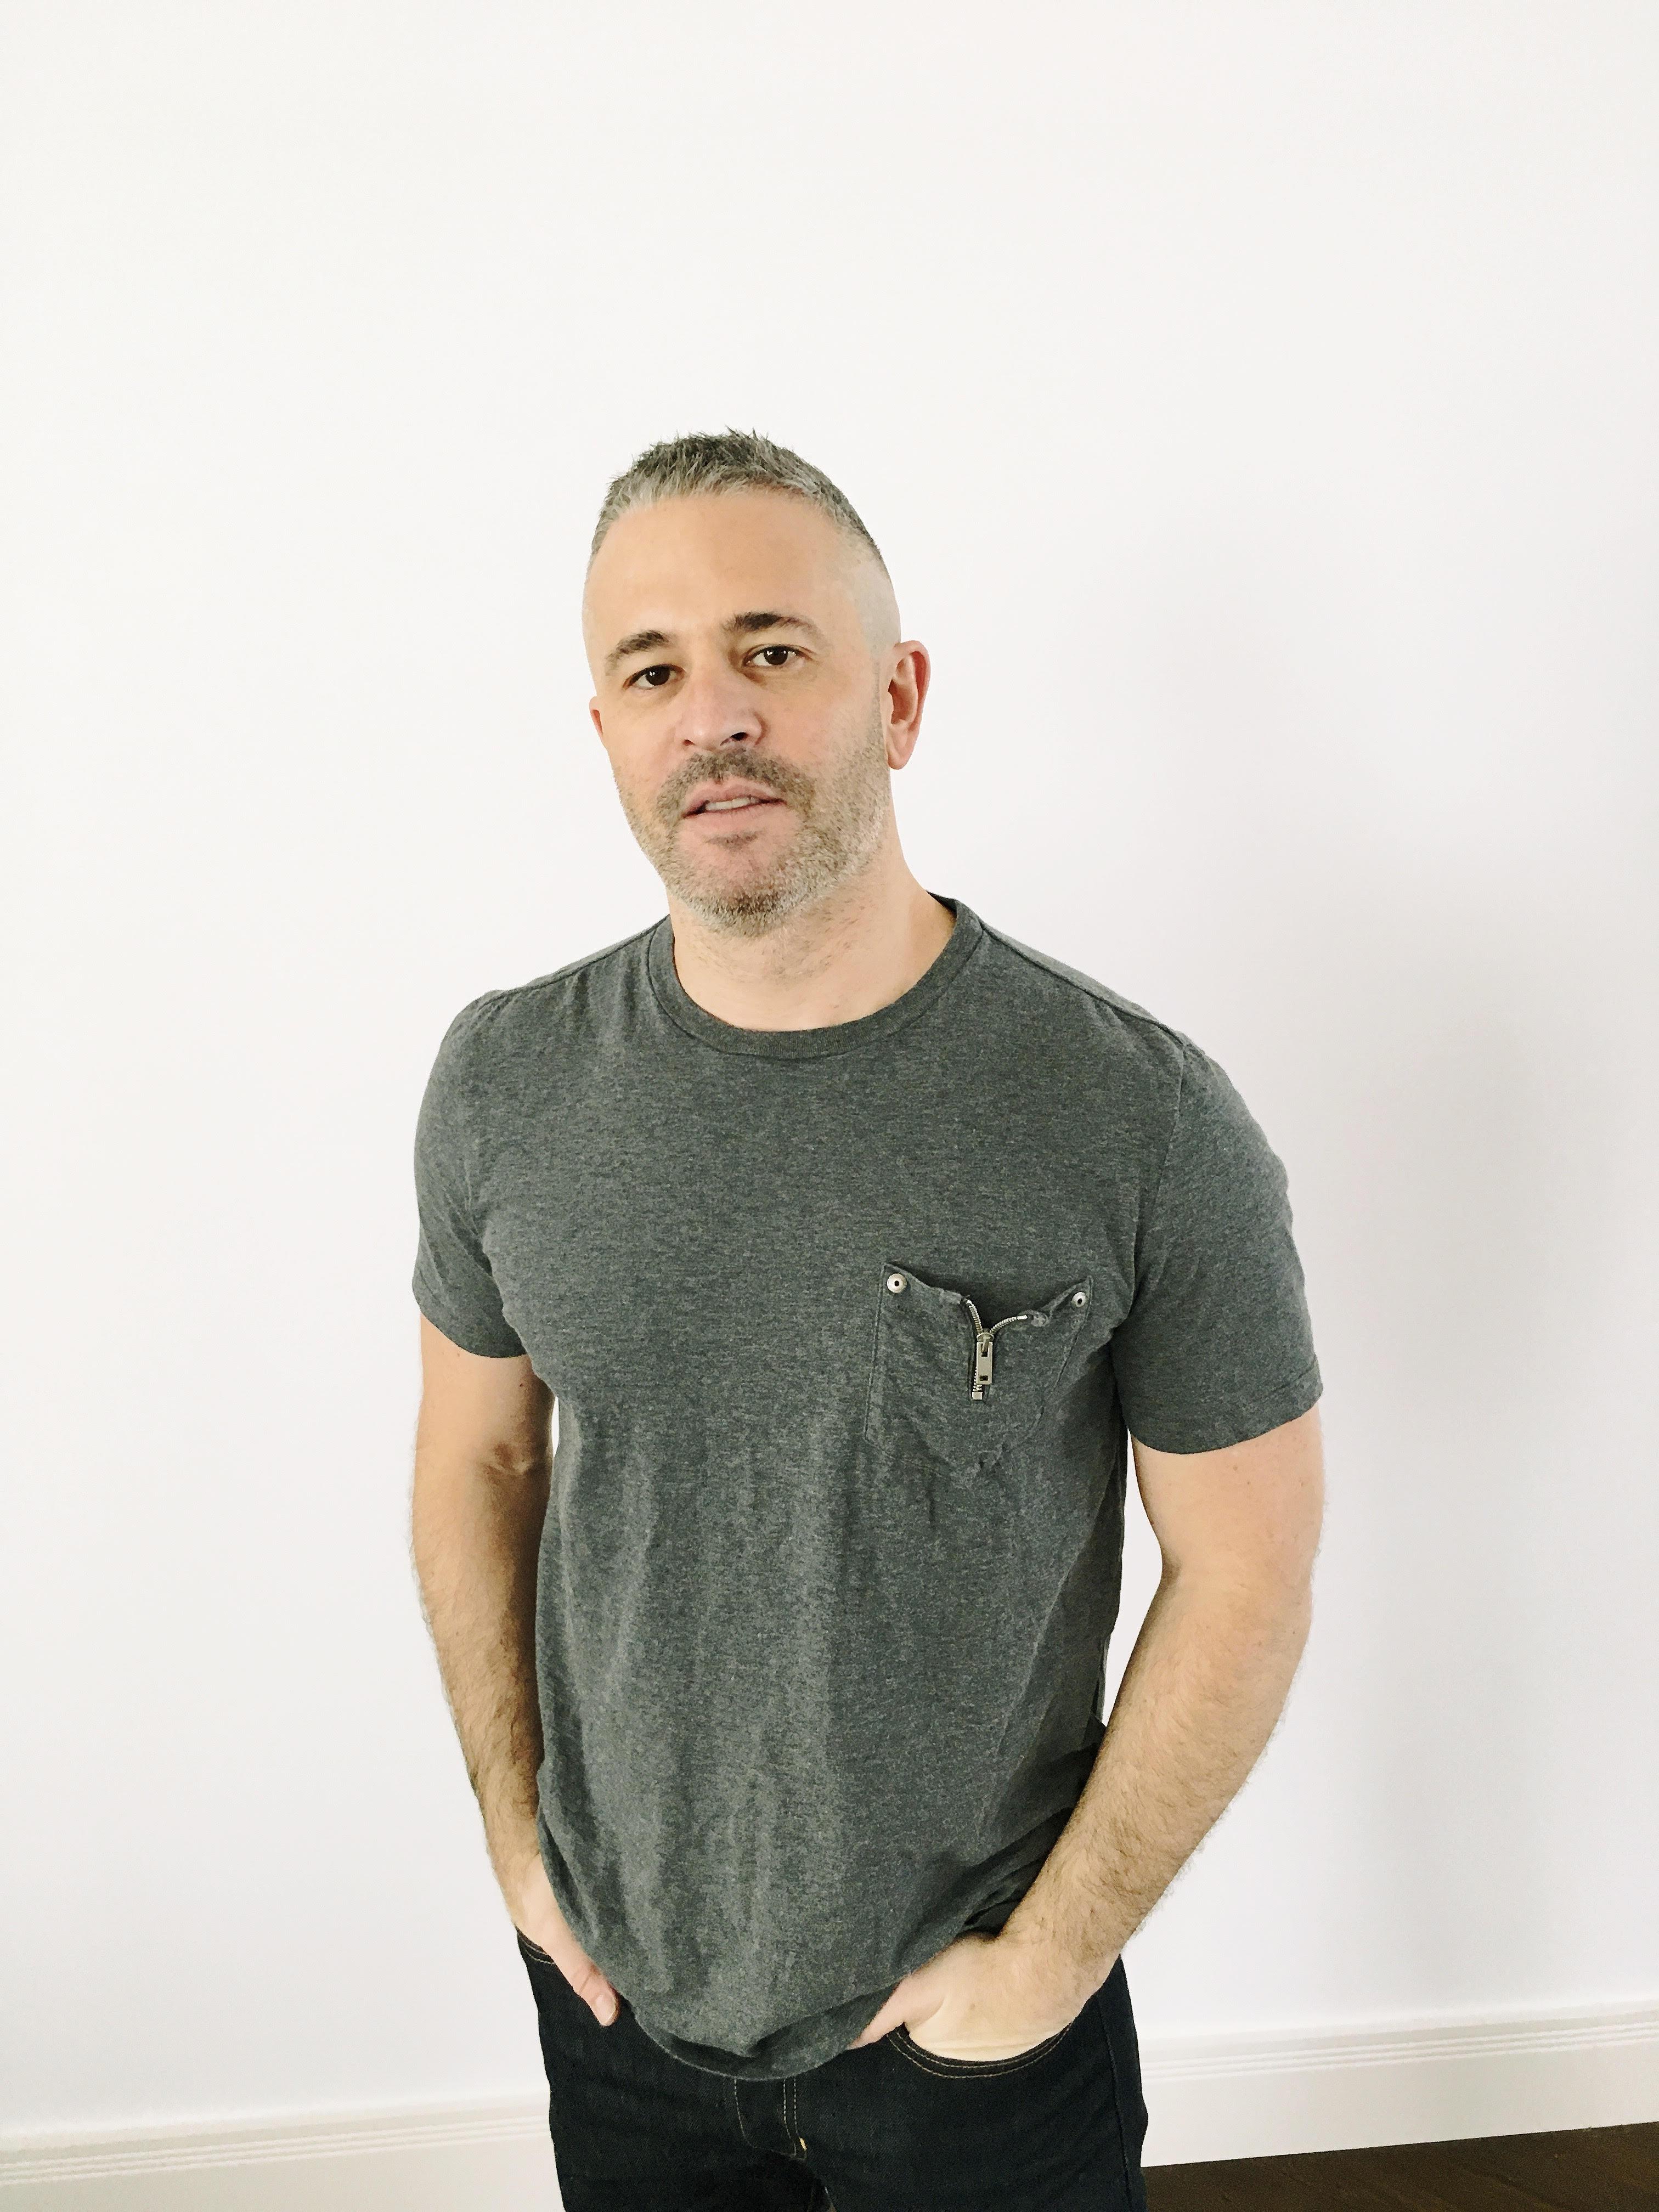 Jason Goldberg Pepo 創辦人暨執行長